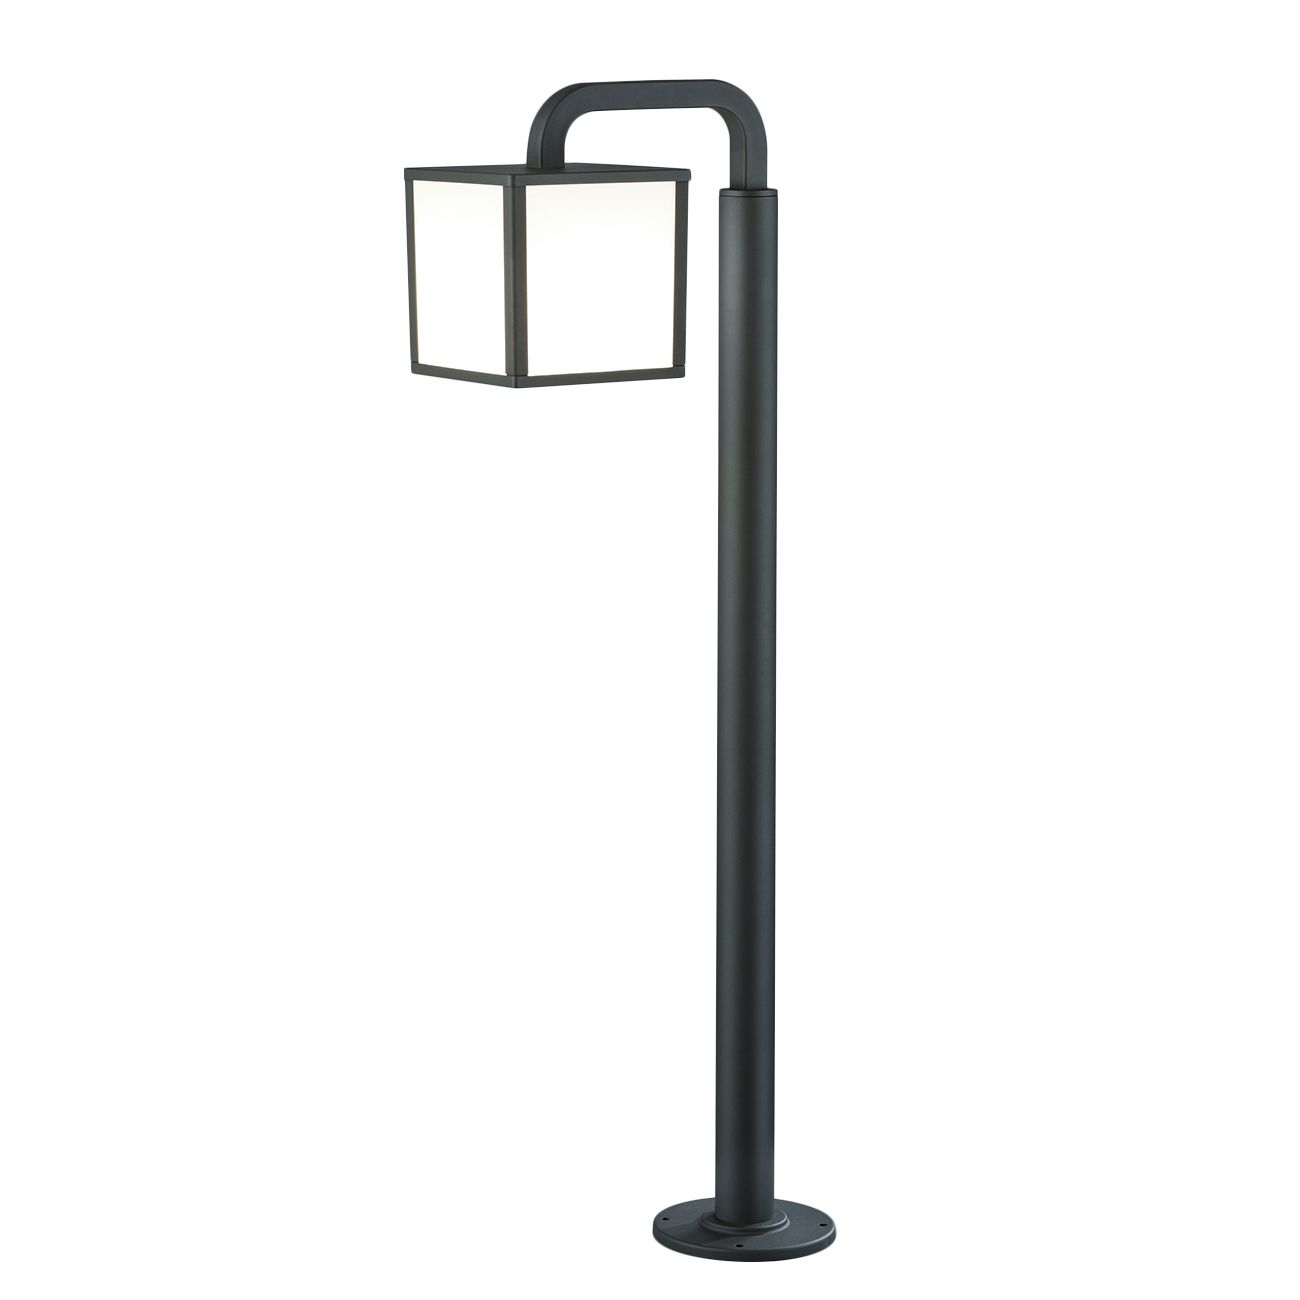 EEK A++, LED-Außenleuchte Cubango 1-flammig - Aluminium Kunststoff - Silber, Trio